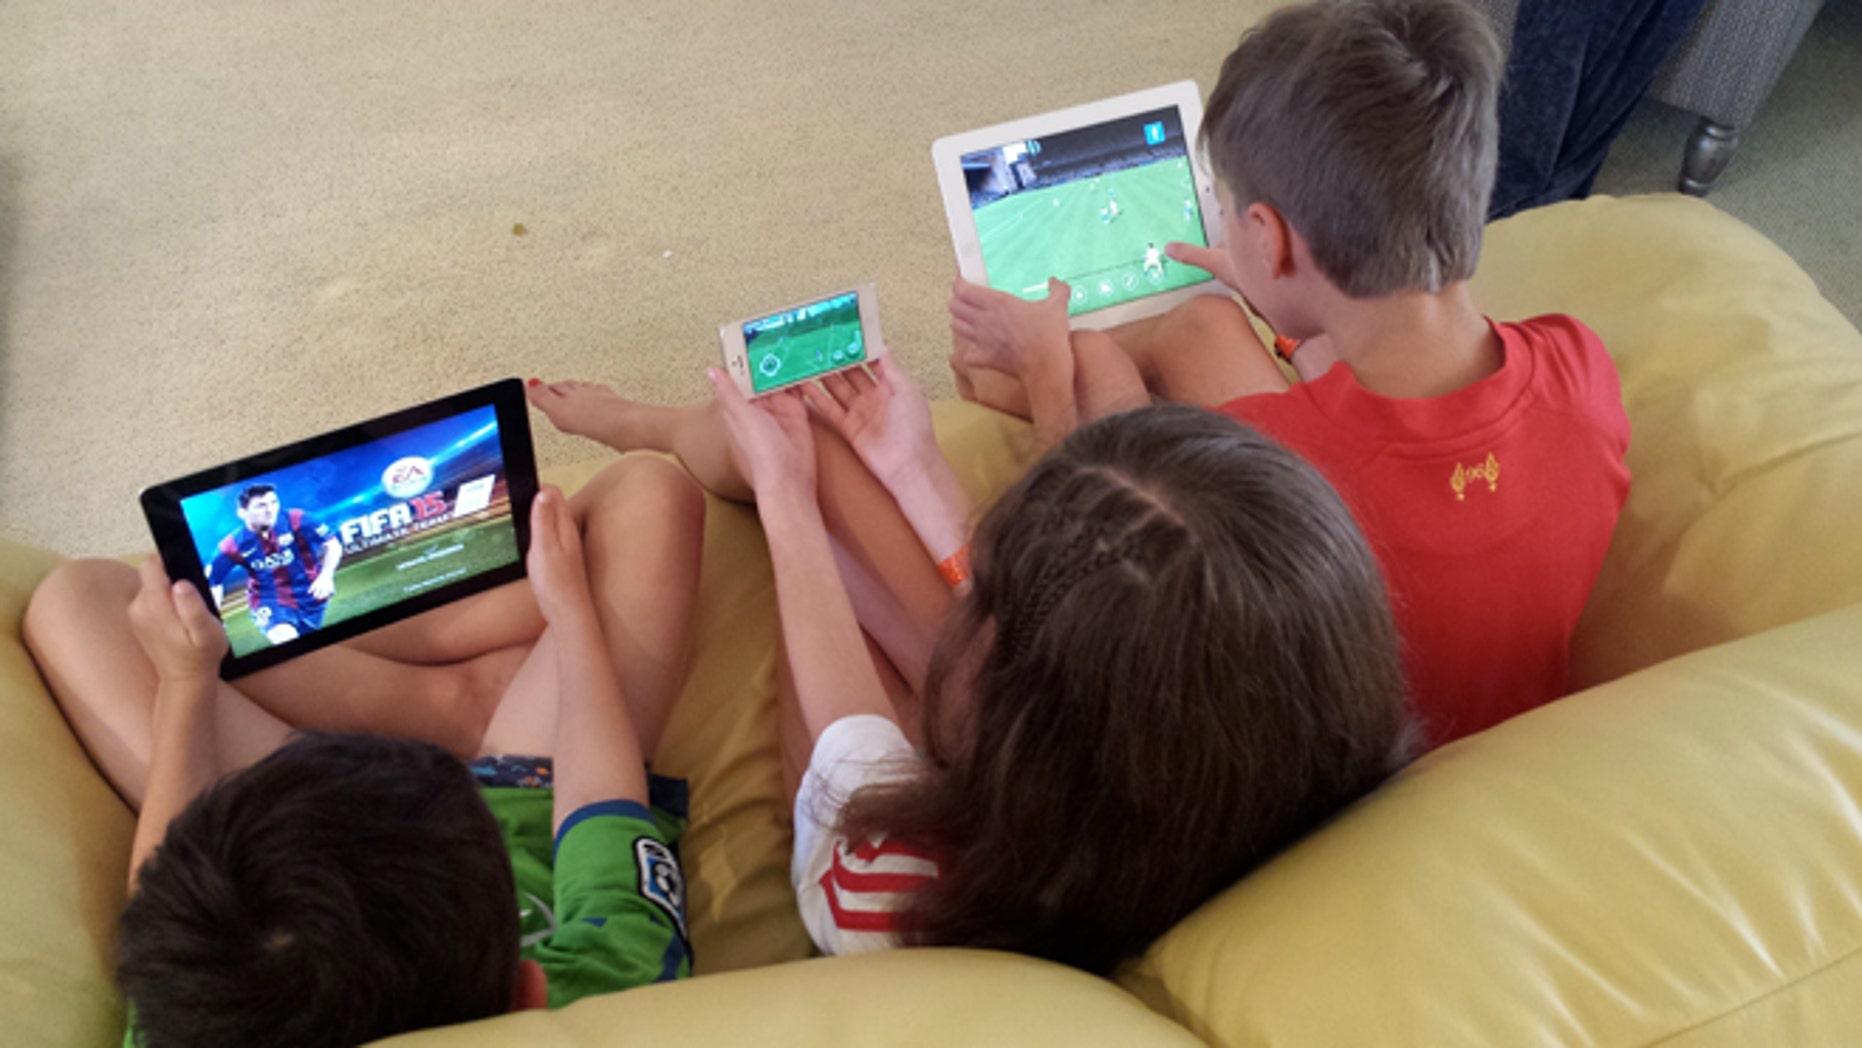 Children enjoying FIFA 2015. (Photo: Ben Evansky/Fox News Latino)